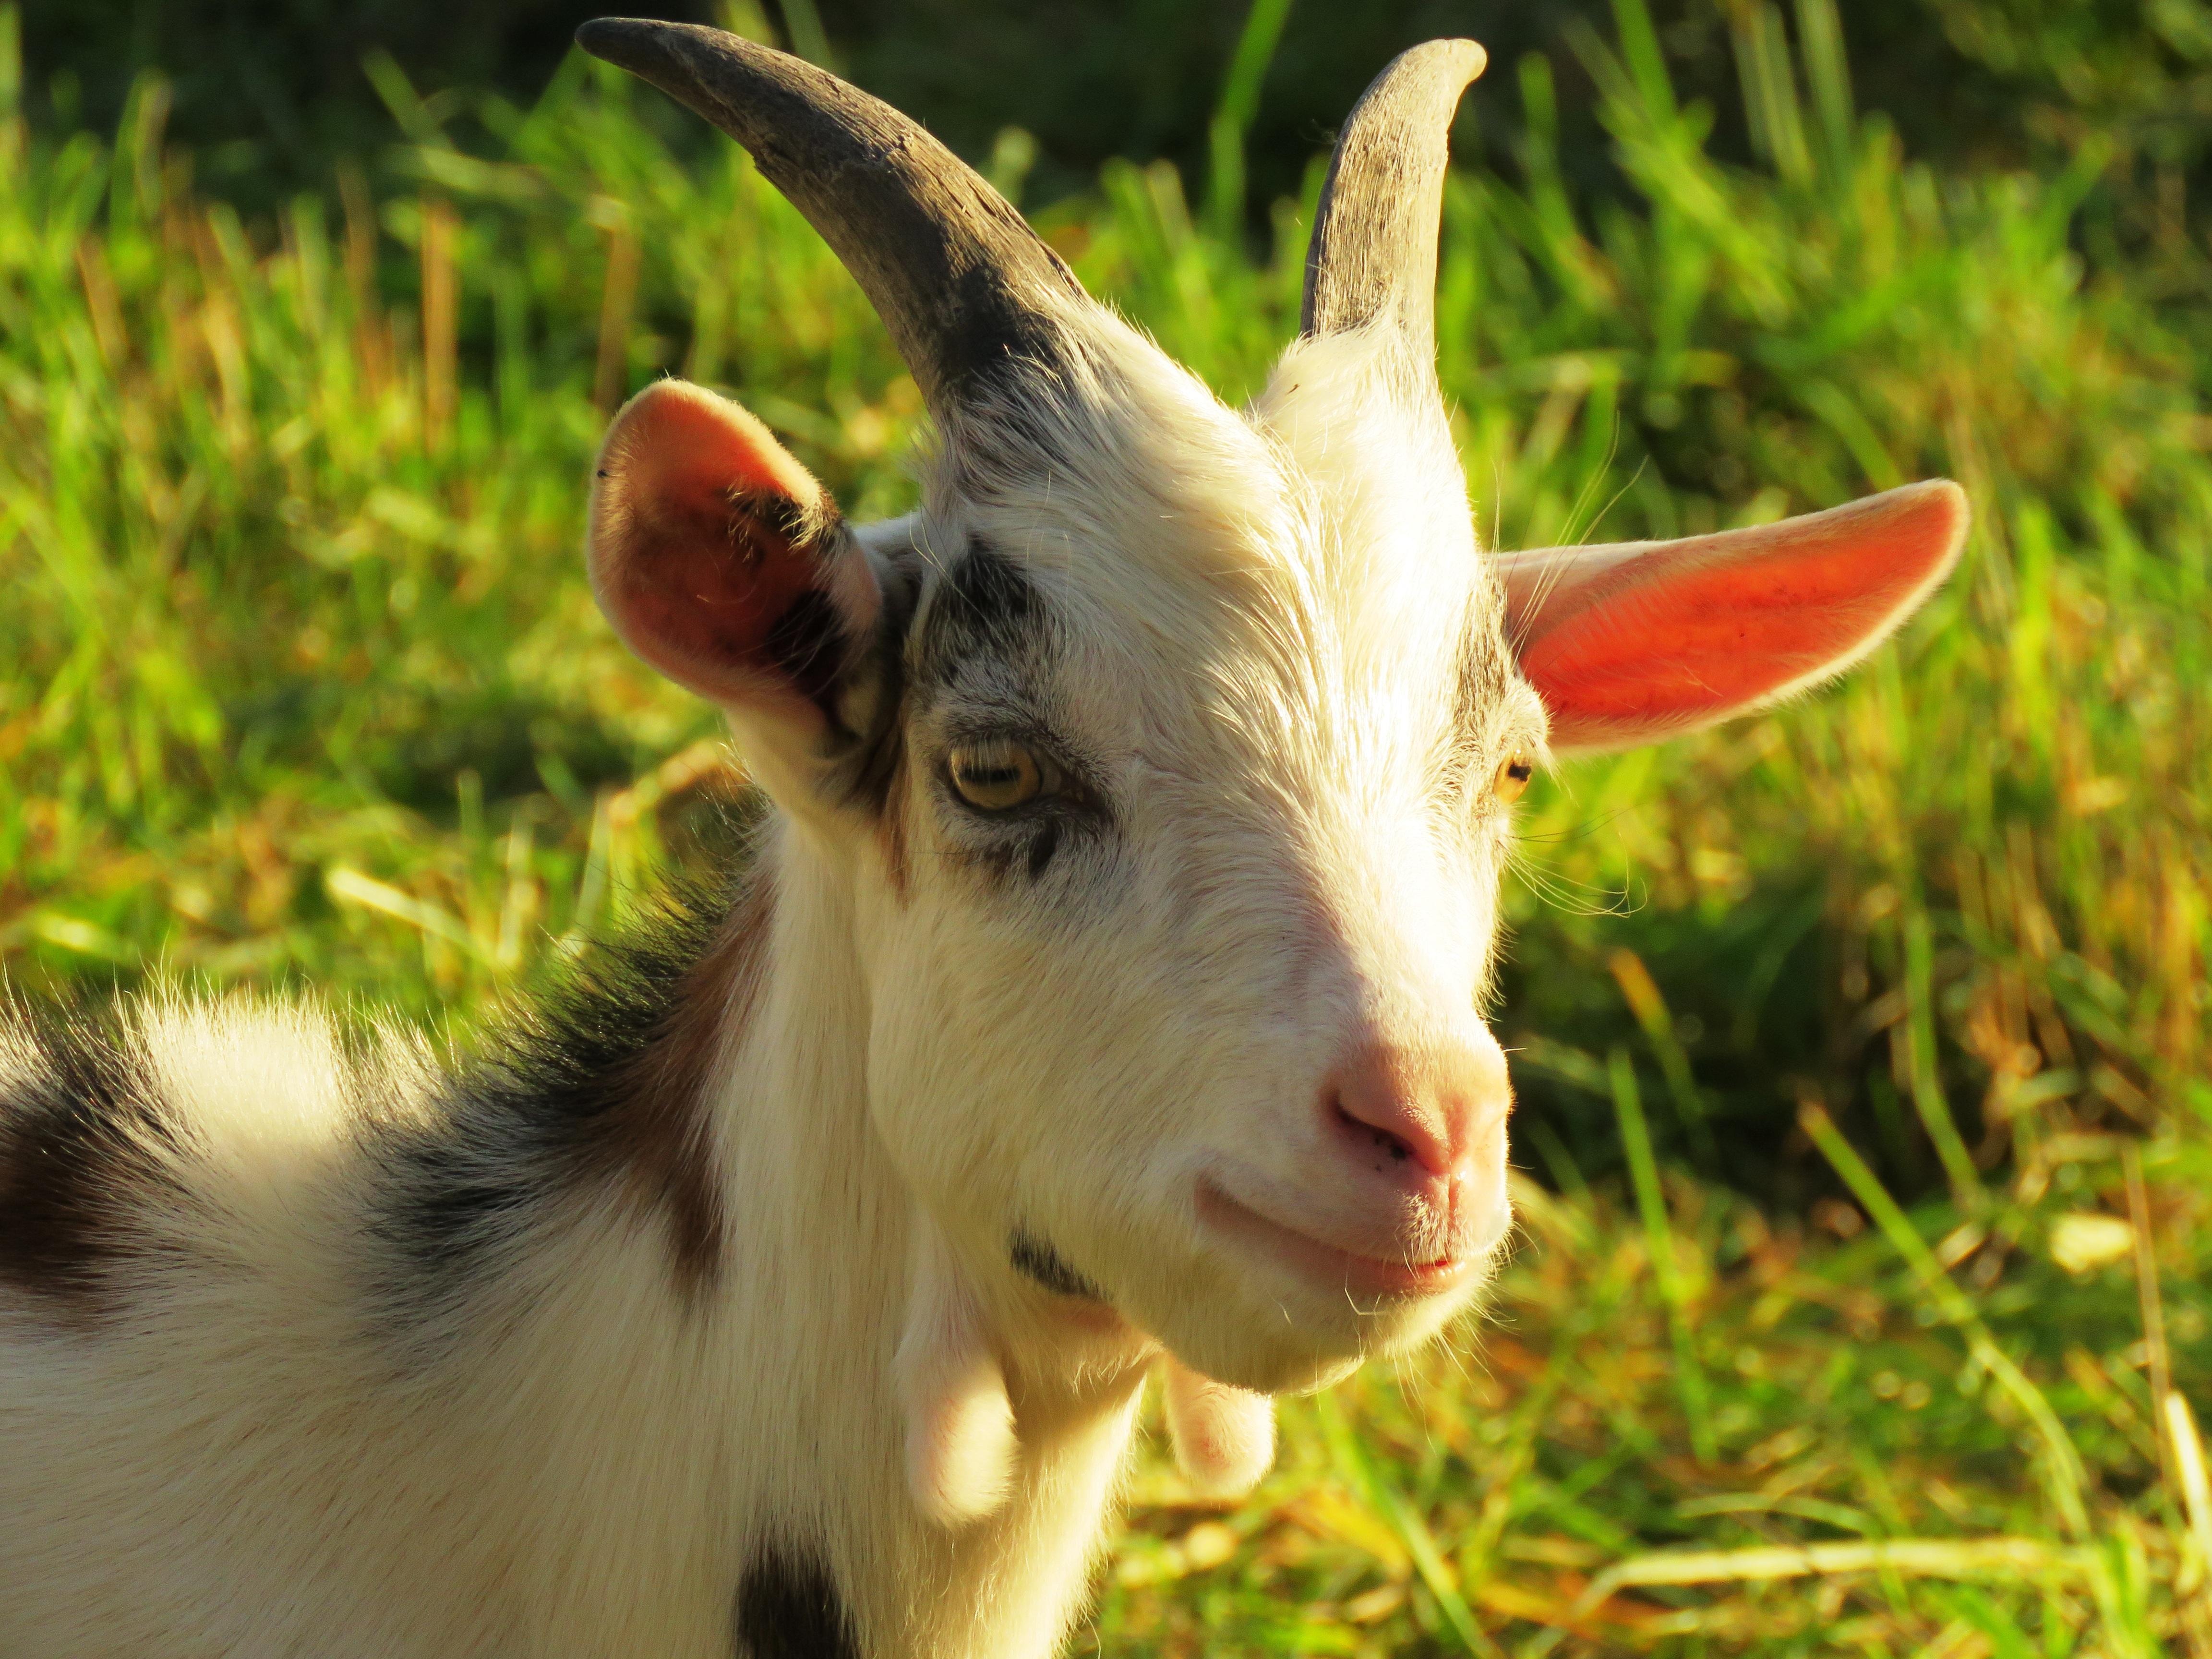 картинки козы картинки козы совместная жизнь